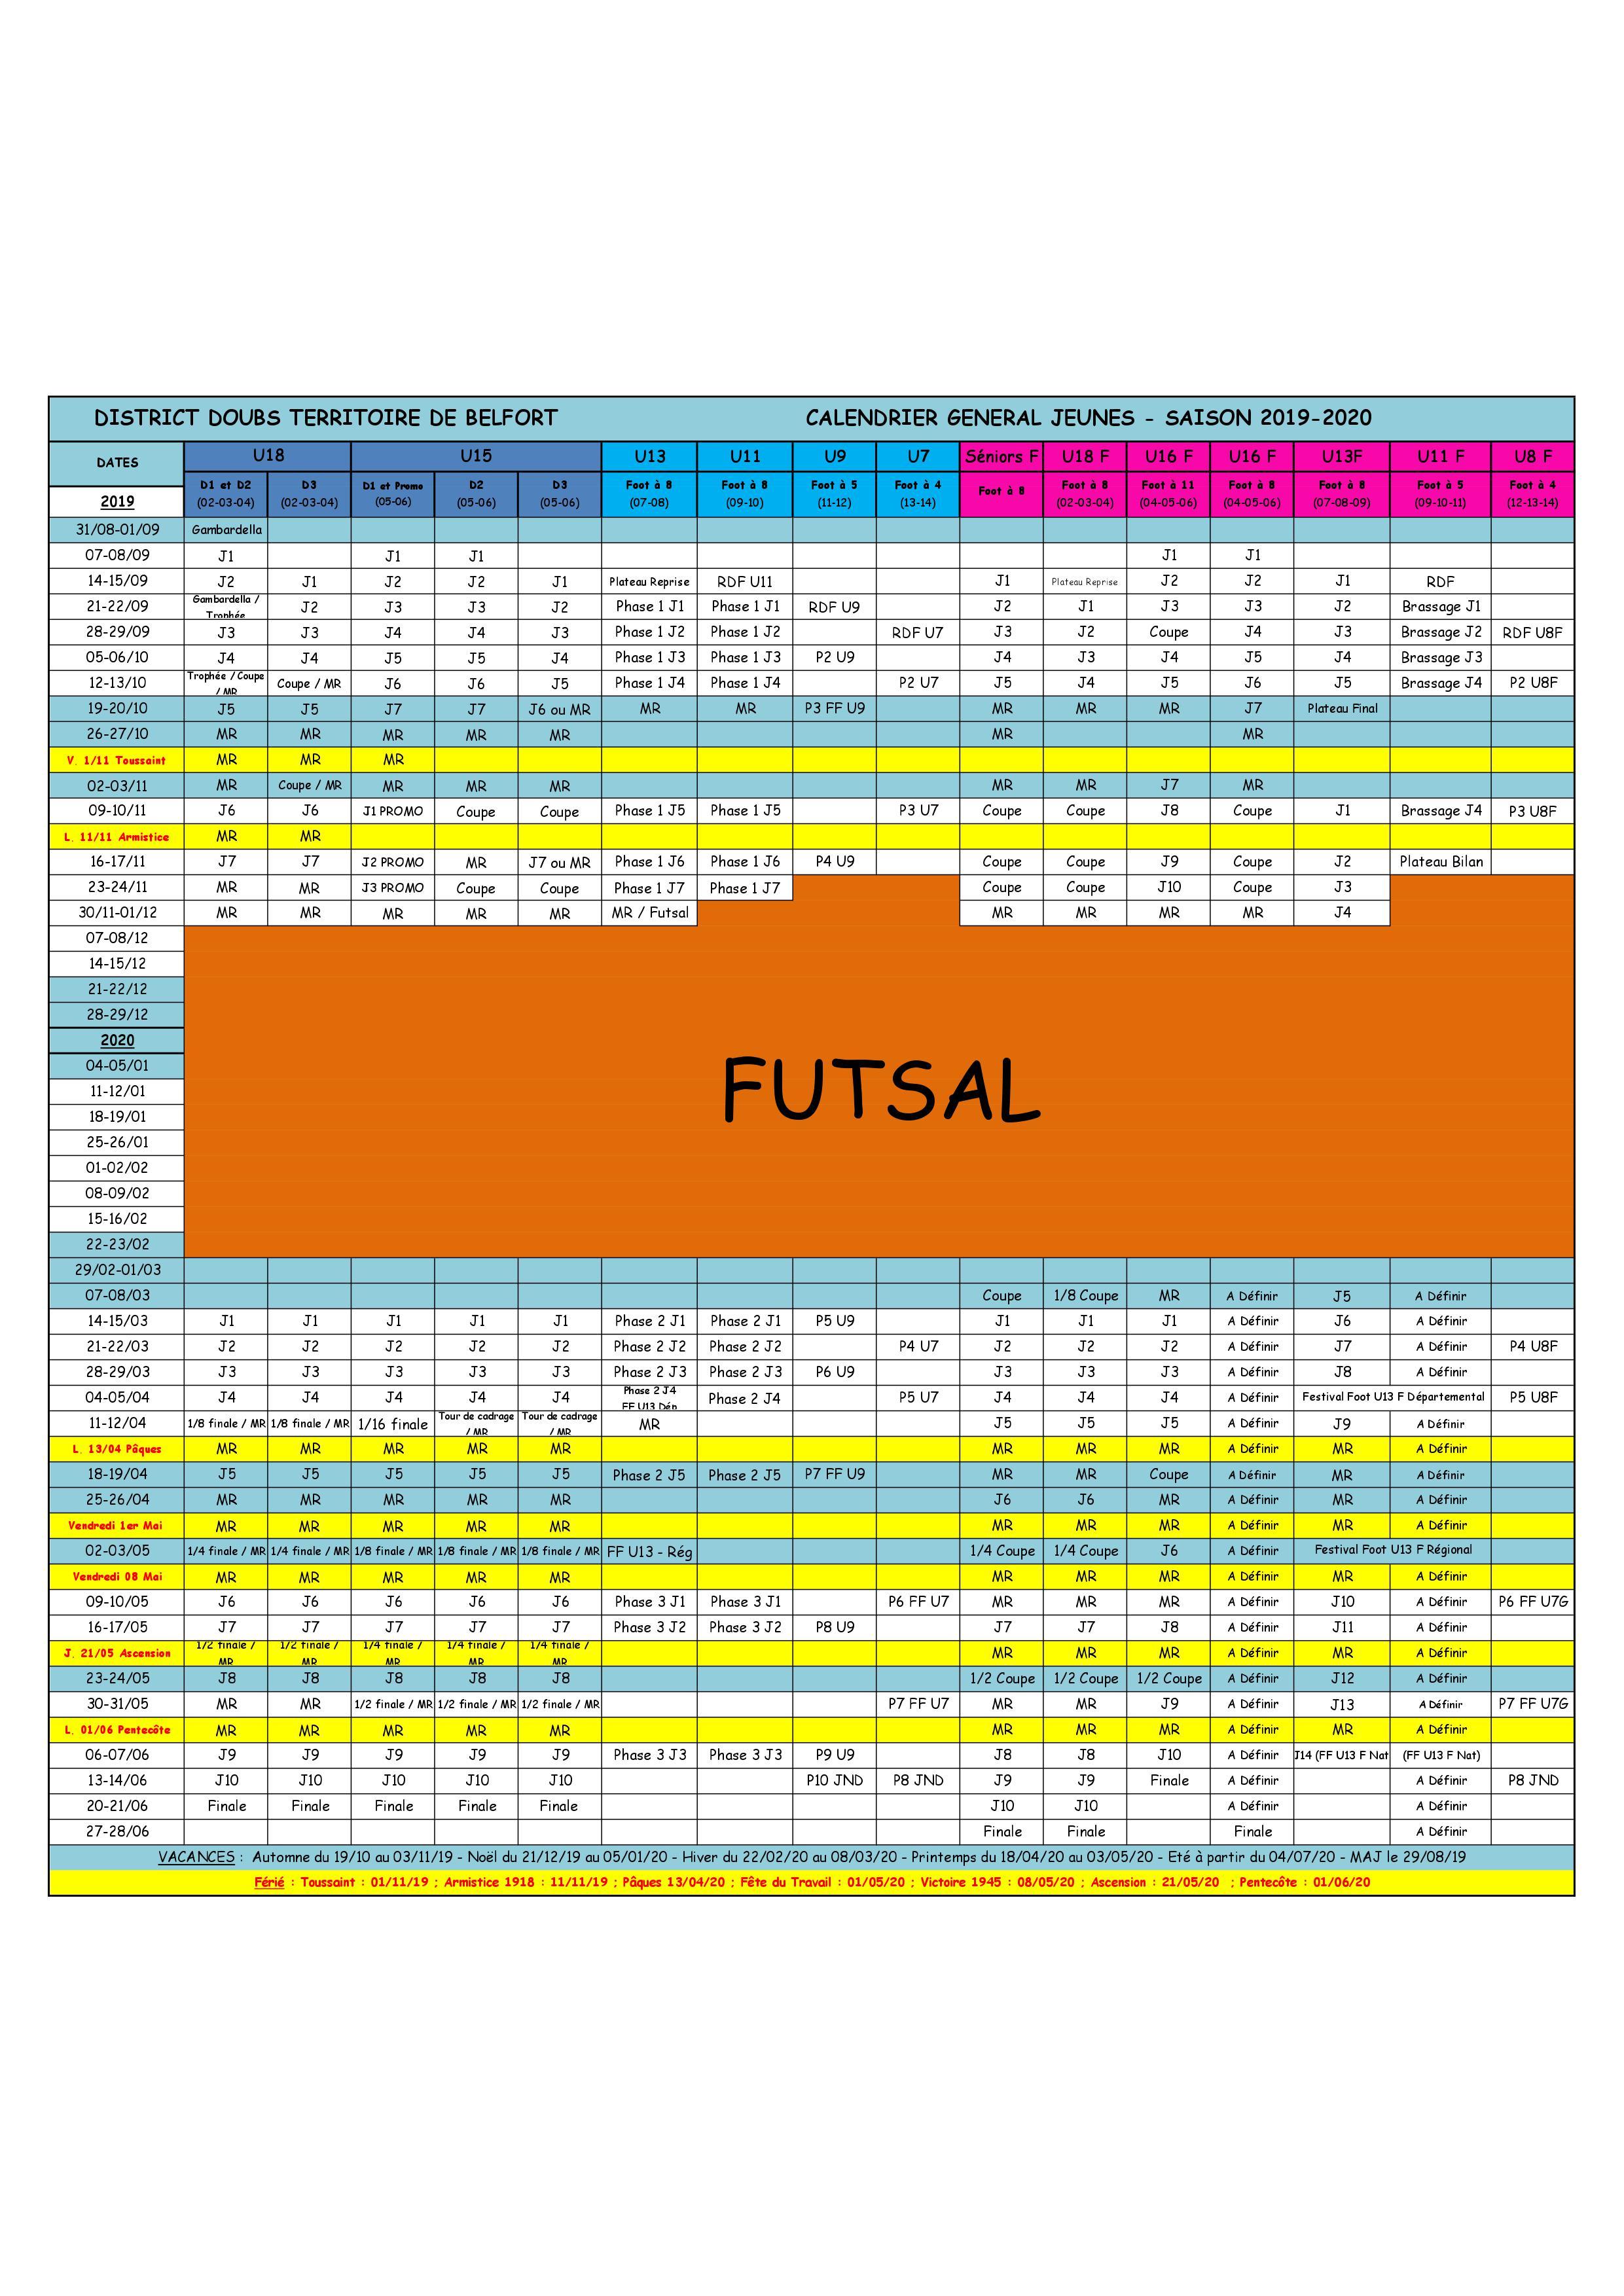 Calendrier Foot 2019 2020.Calendrier General Jeunes Saison 2019 2020 Club Football